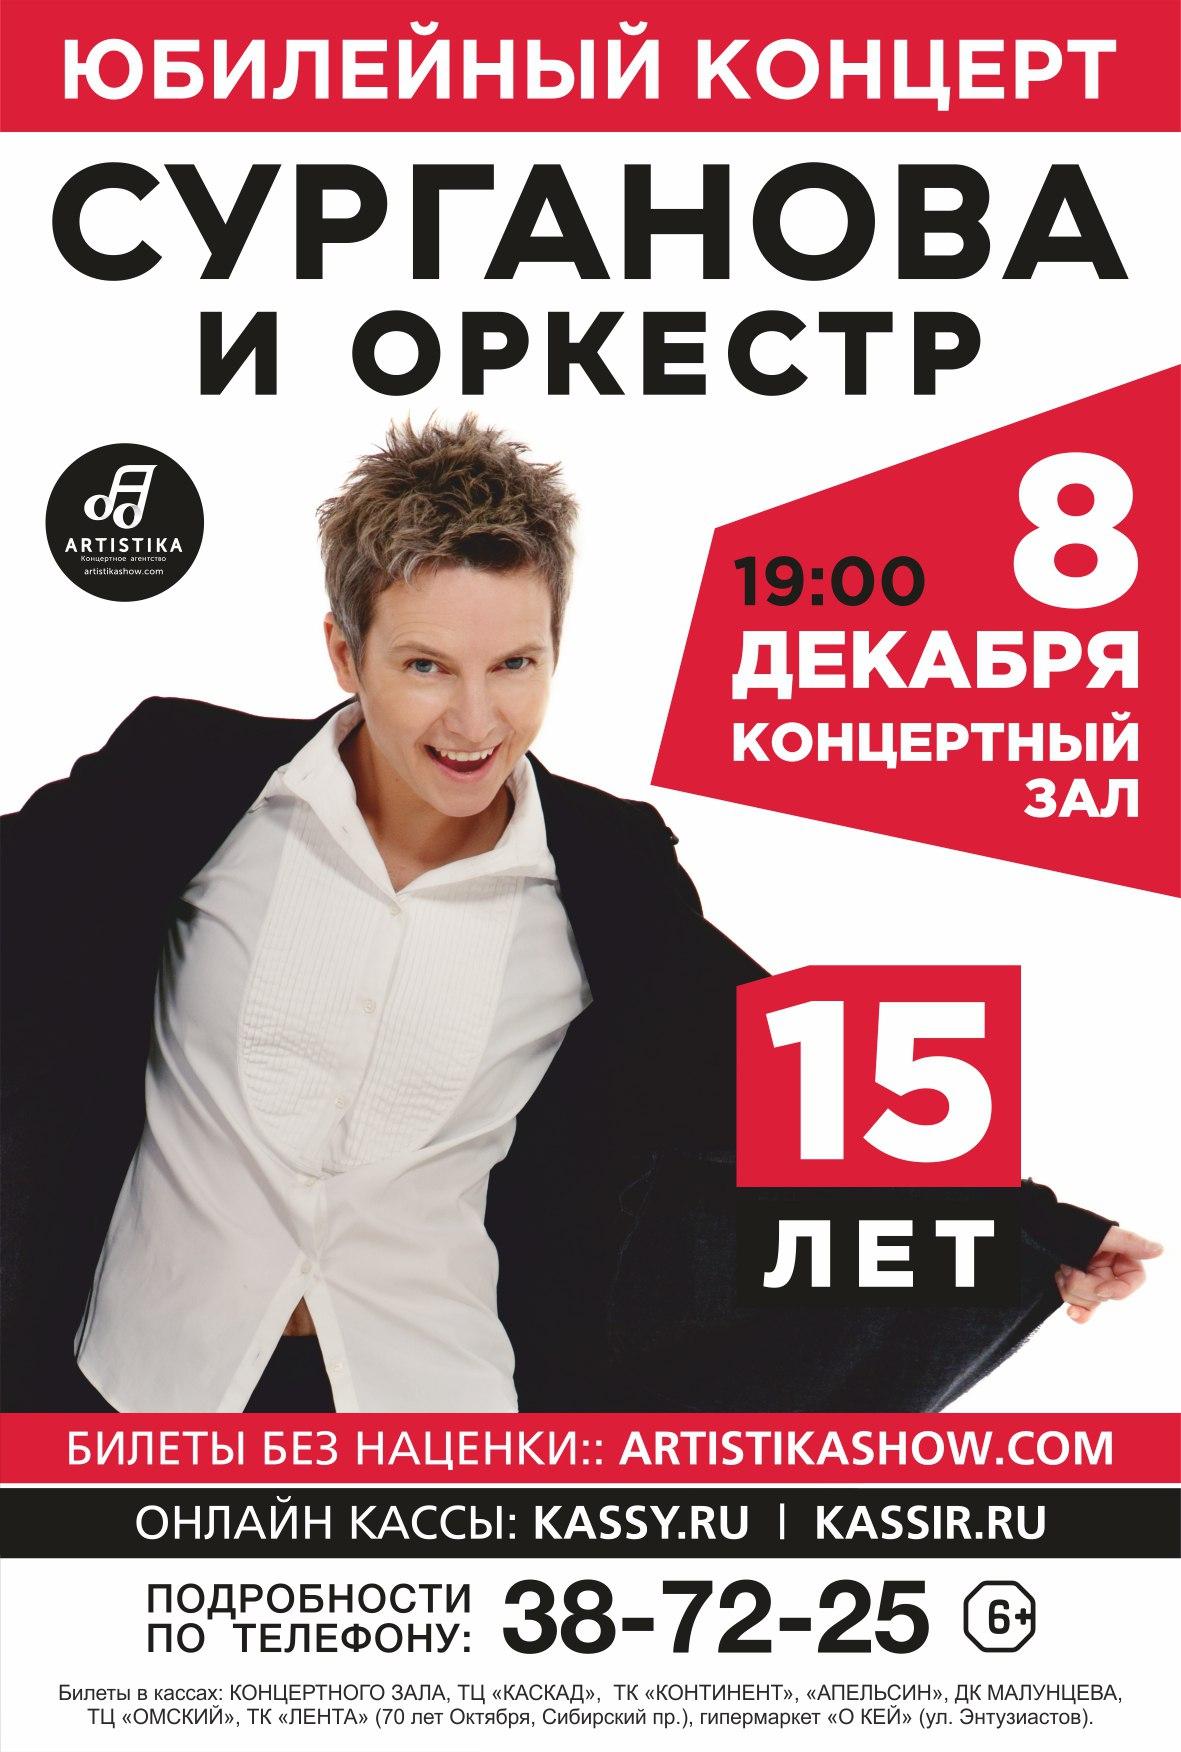 Афиша омск концерты концертный зал театр афиша на апрель 2016